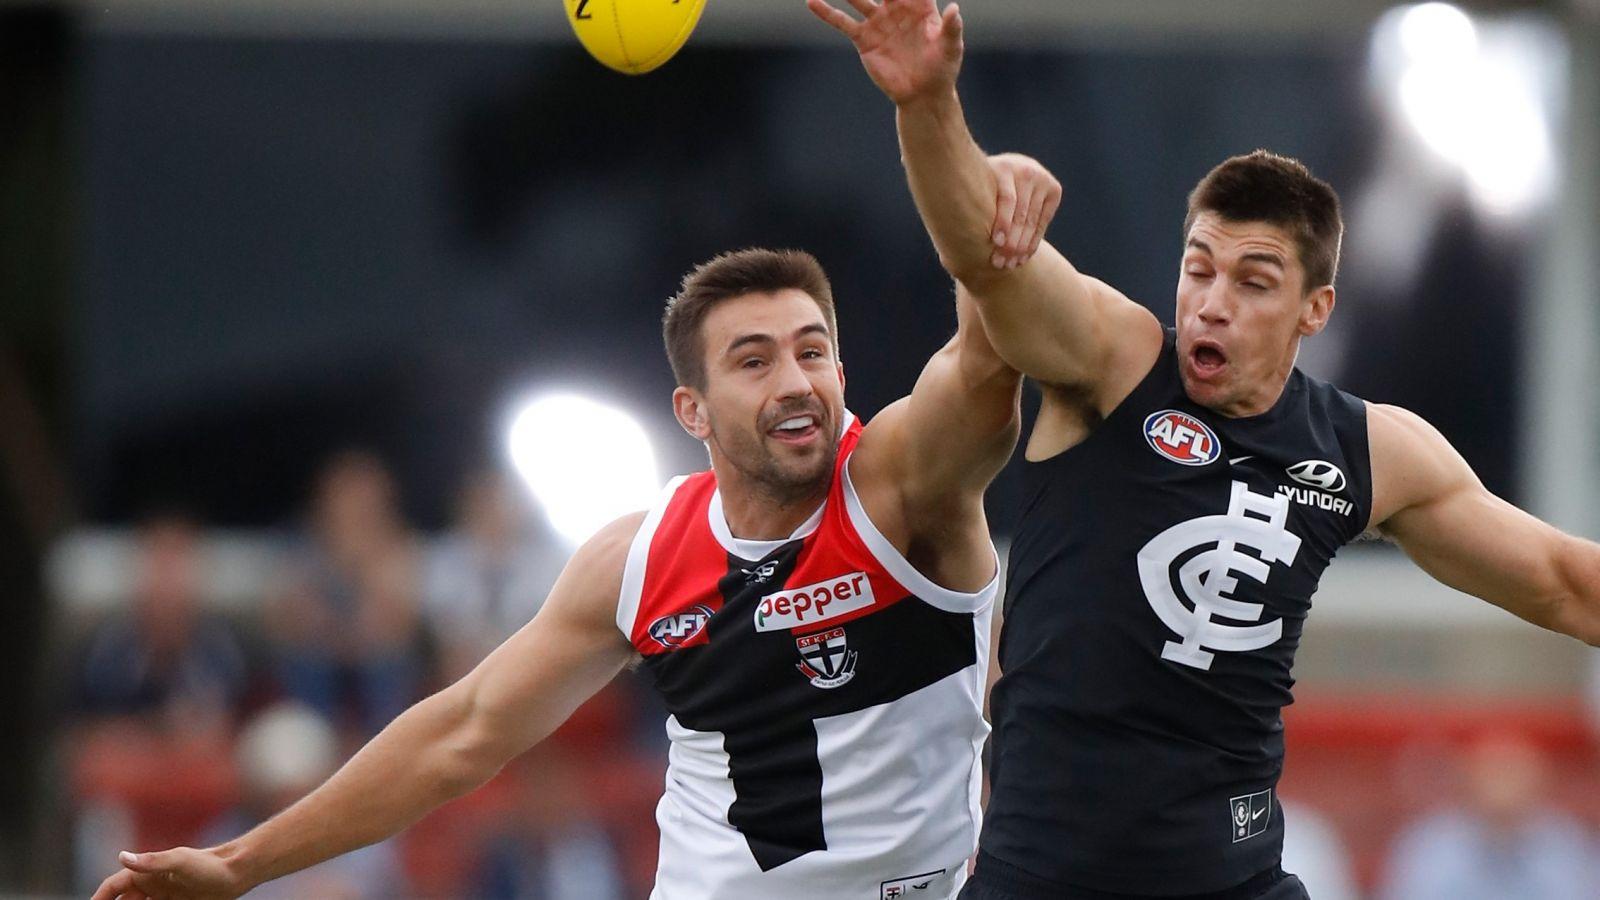 Crunching Numbers: Round 17 St Kilda vs Carlton AFL DFS Lineup Tips